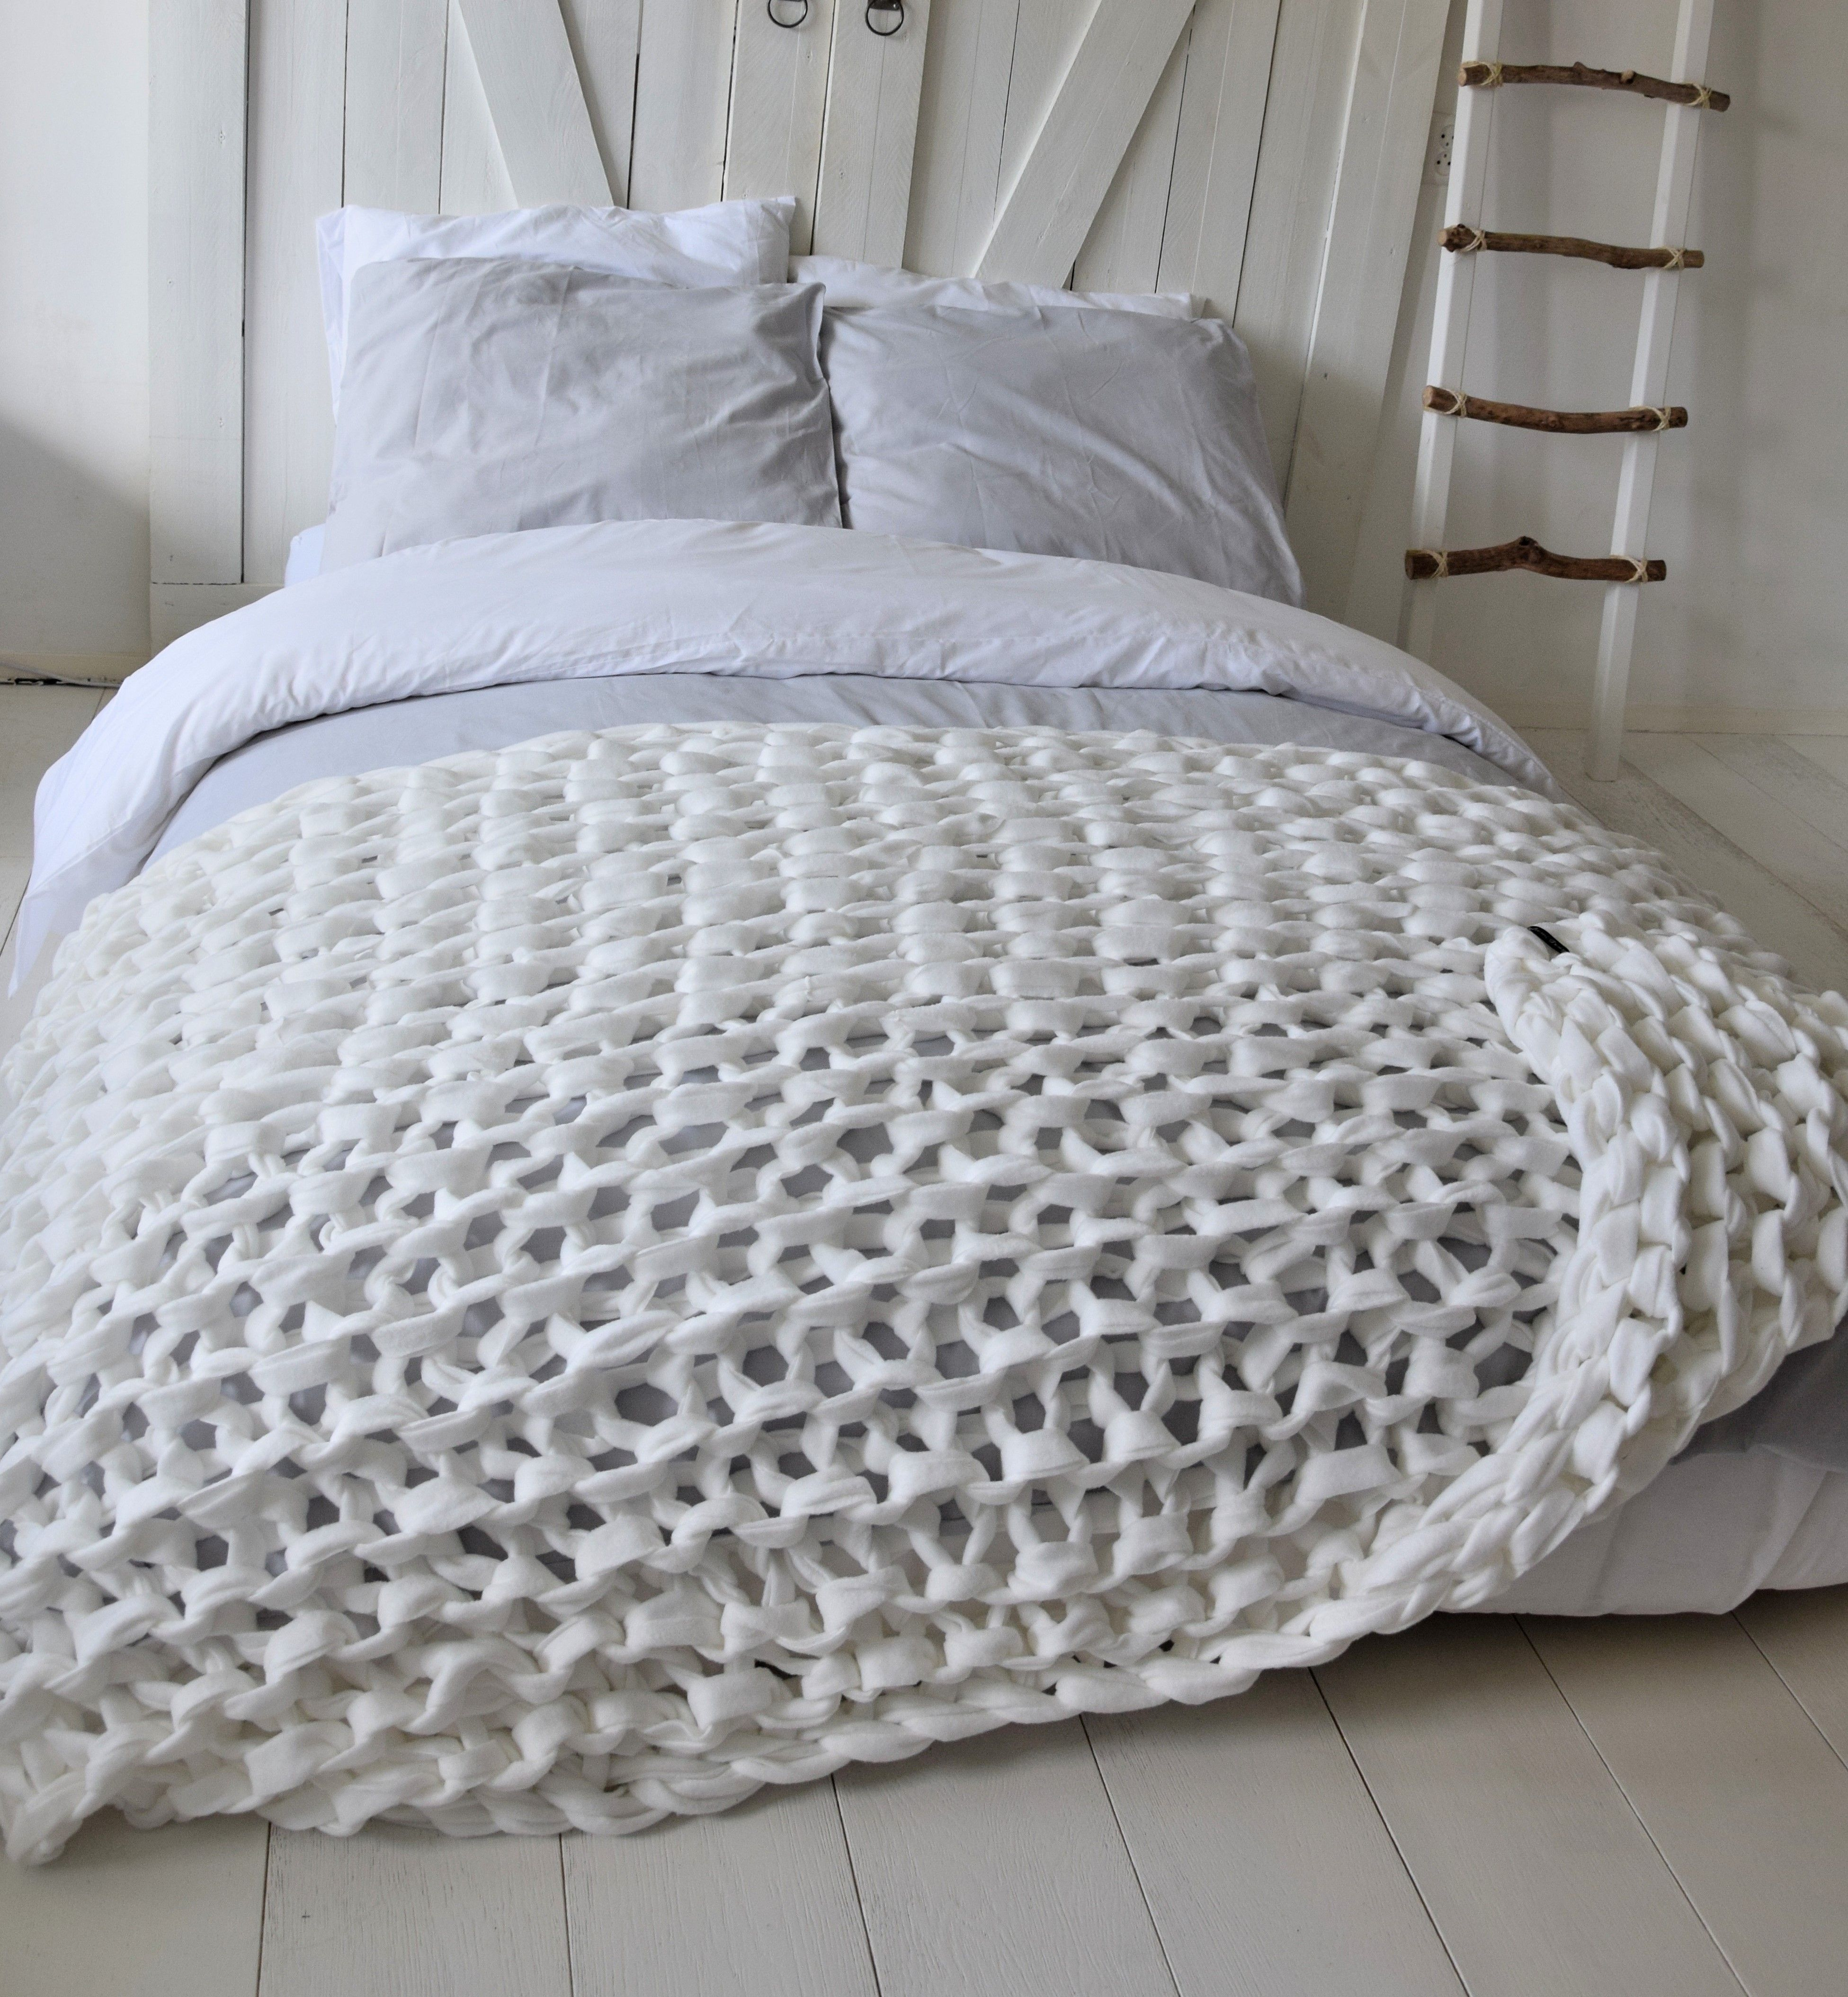 66ab0bdfa02f4e Grof gebreid plaid - Uniek XXL gebreide fleece deken van het merk Dehewi  Design - Te koop bij Dehewi Home